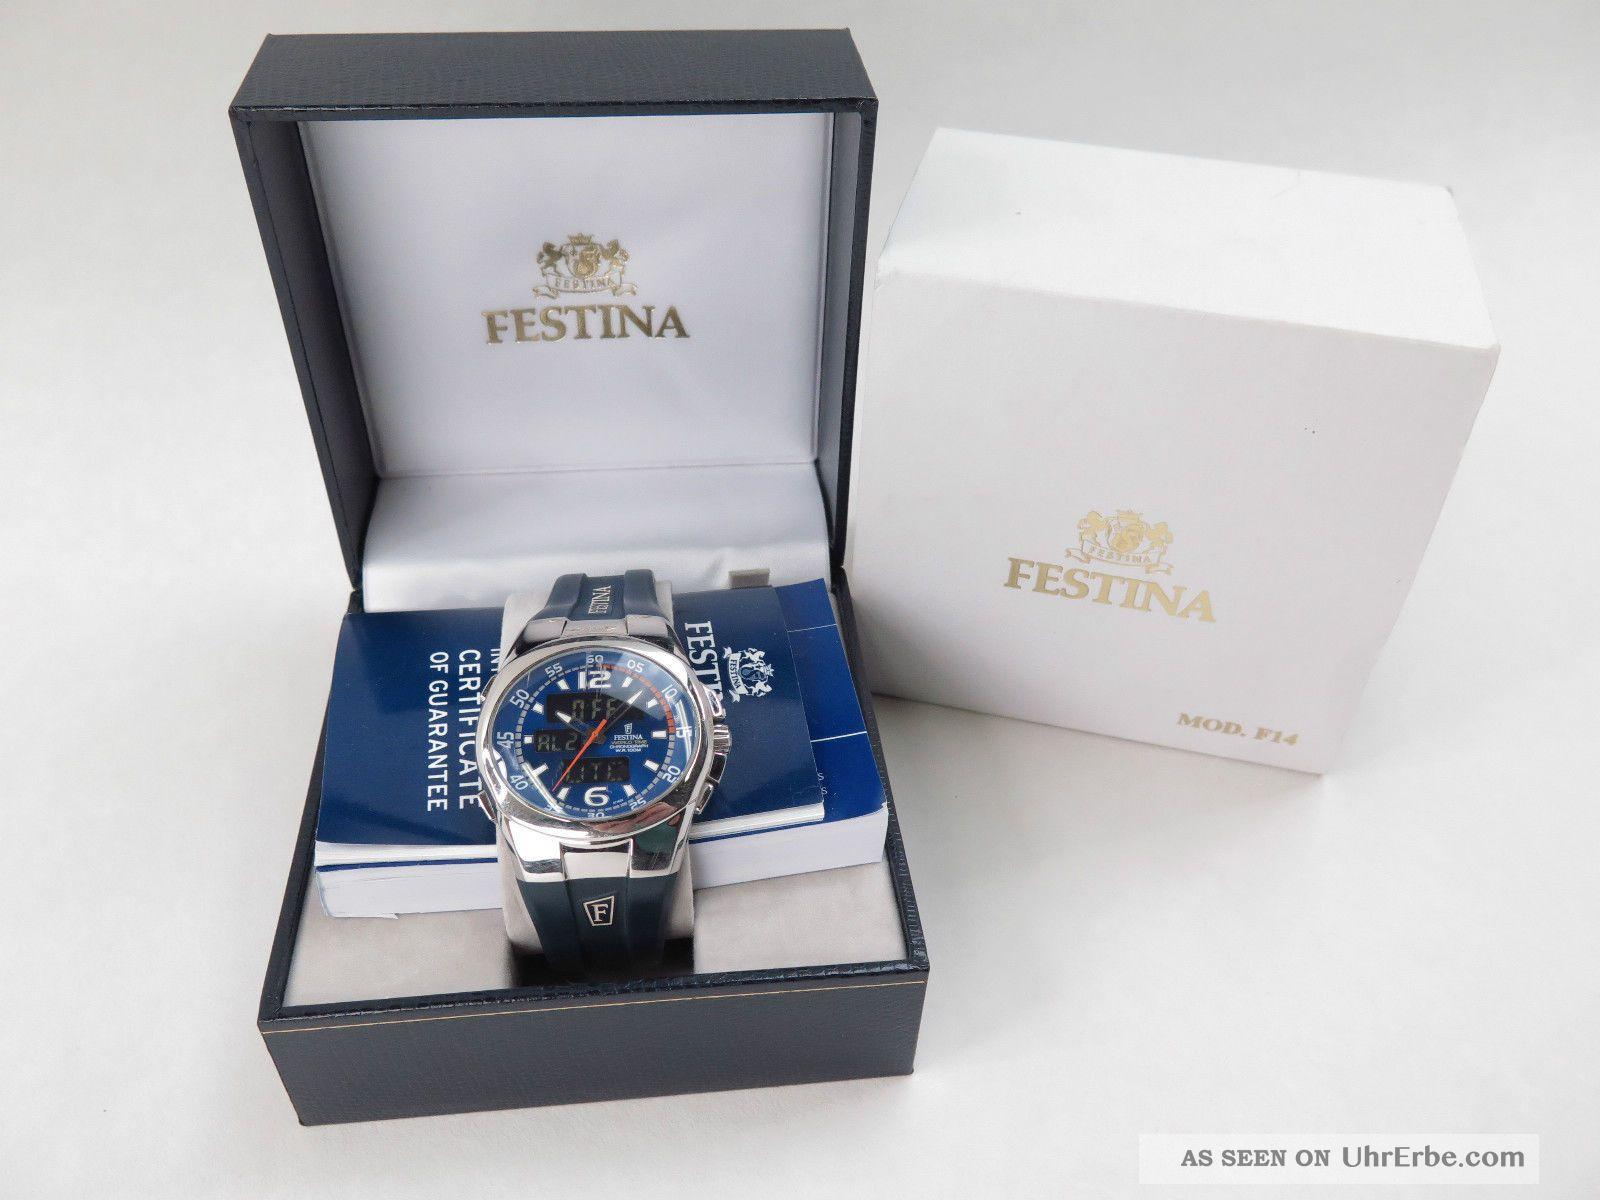 Festina Worldtime Chronograph - Armbanduhr Armbanduhren Bild